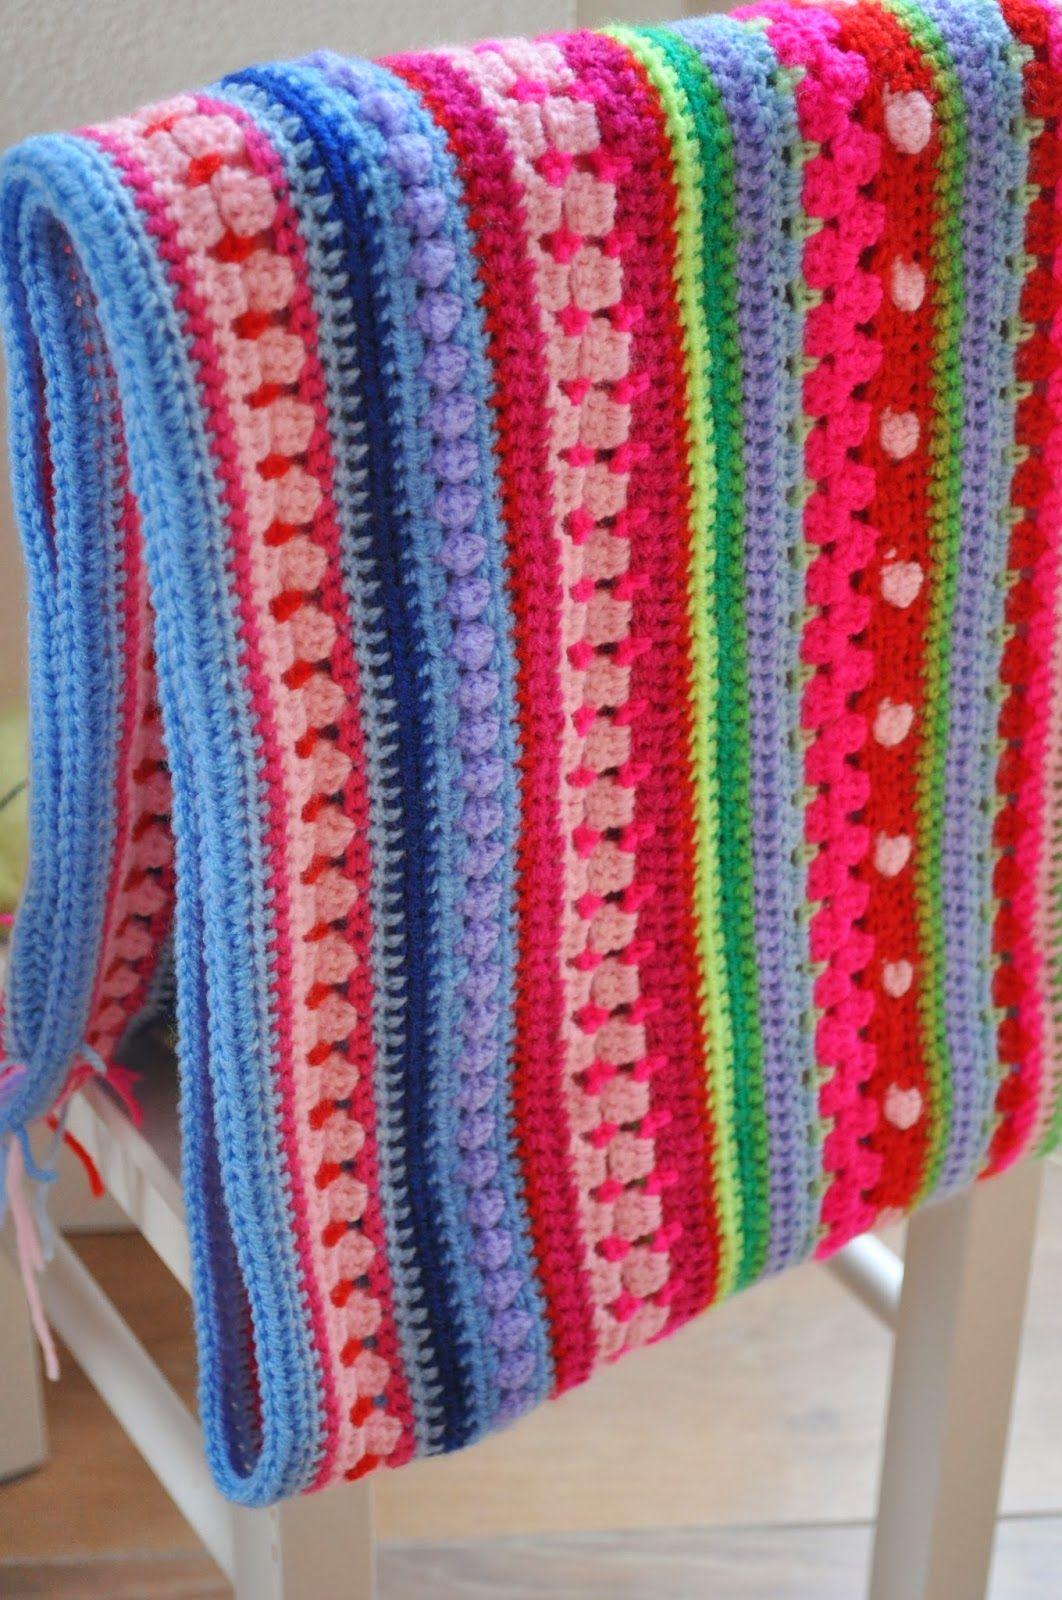 'T Busy Bijtje Cheerful stripes blanket!